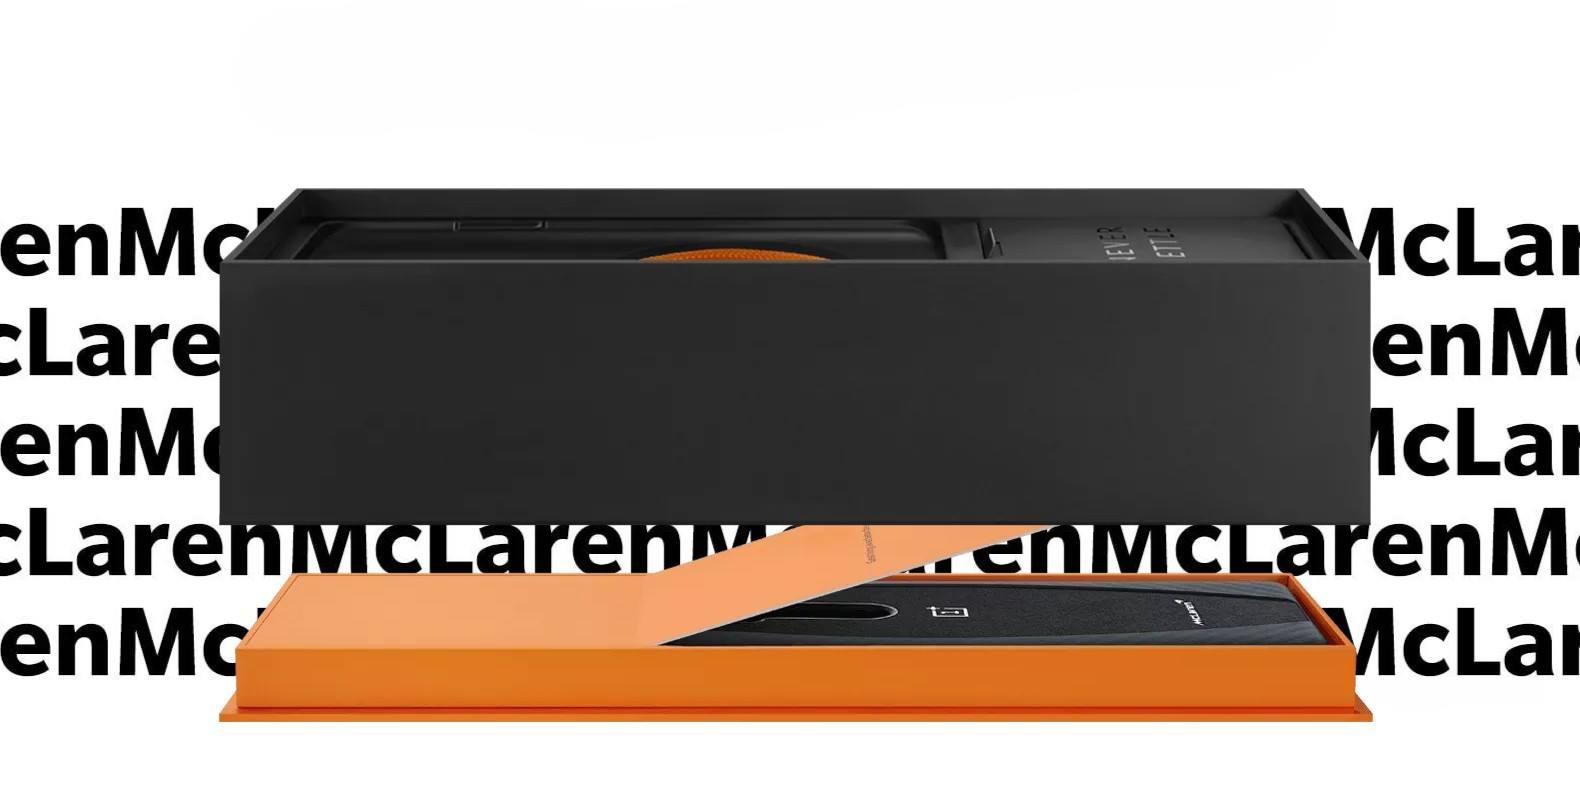 OnePlus 7T Pro 5G McLaren (4)